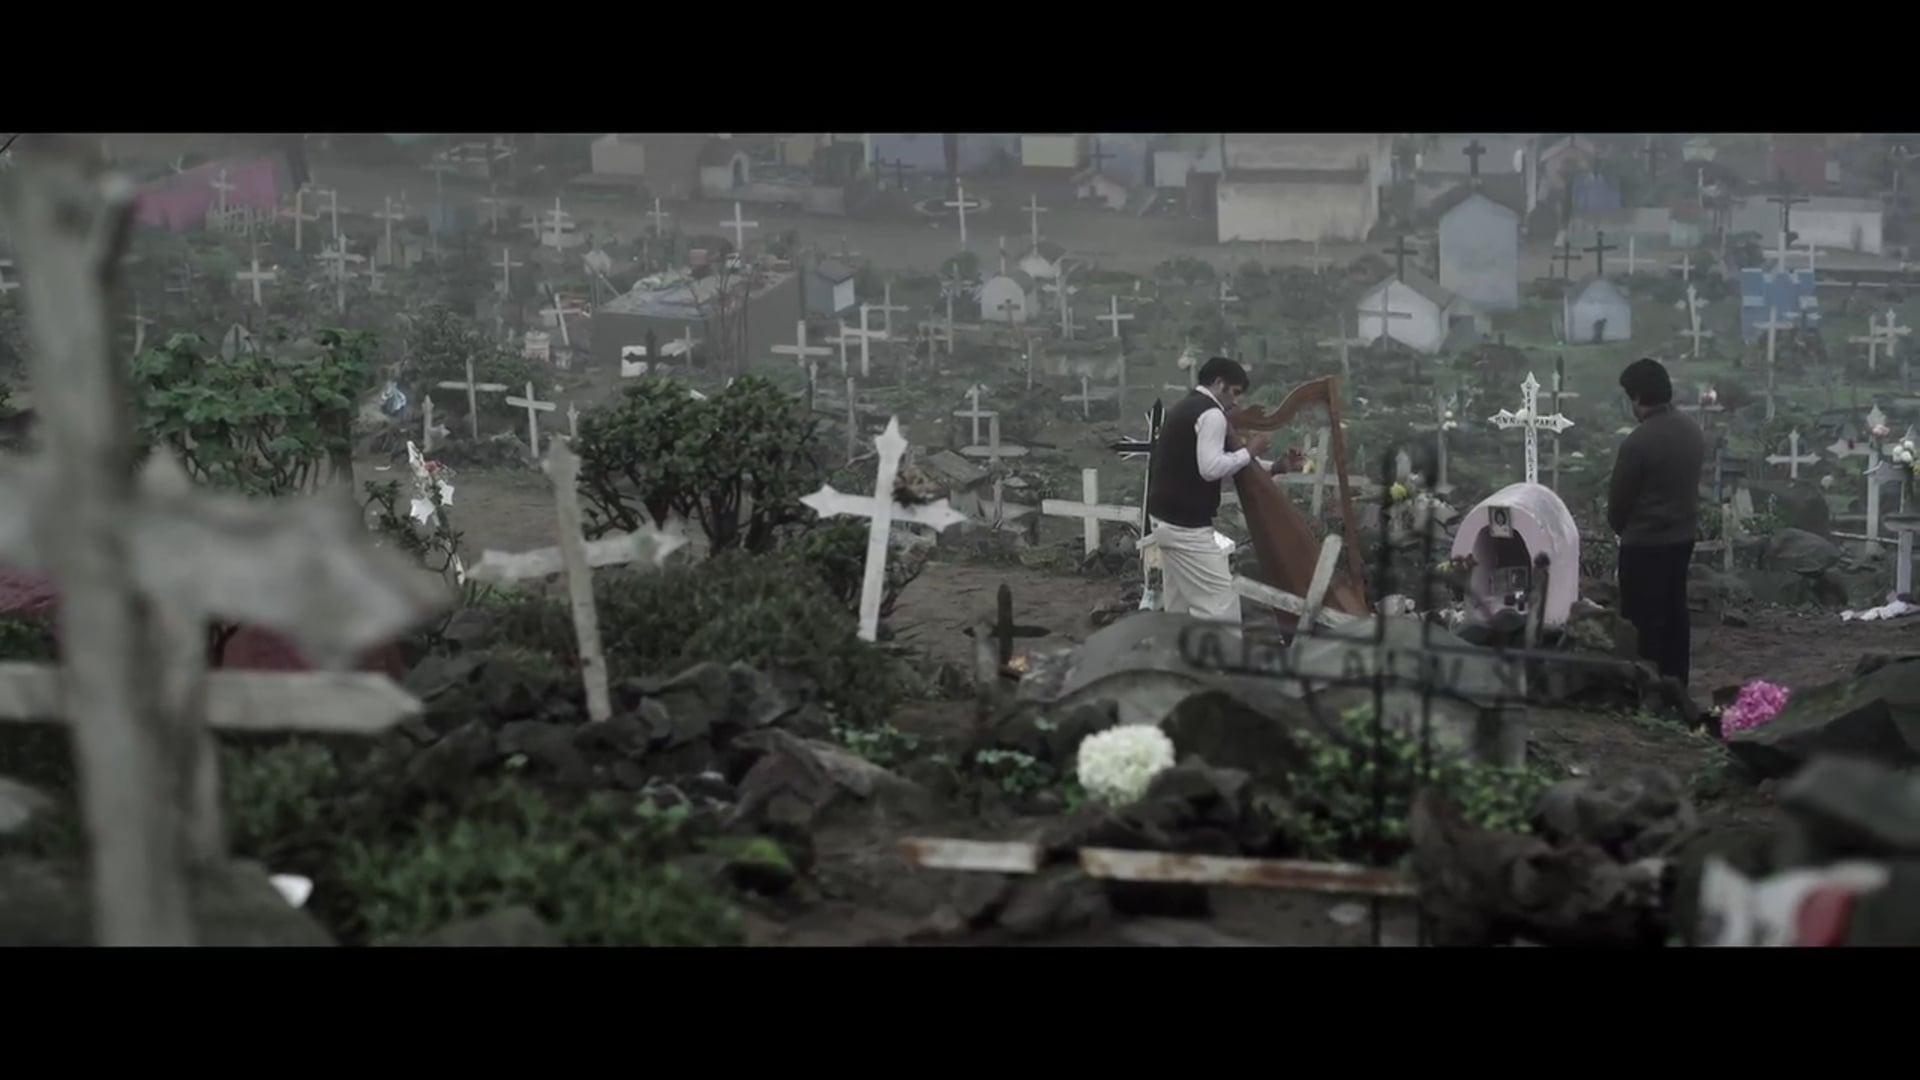 EL HUECO - THE HOLE